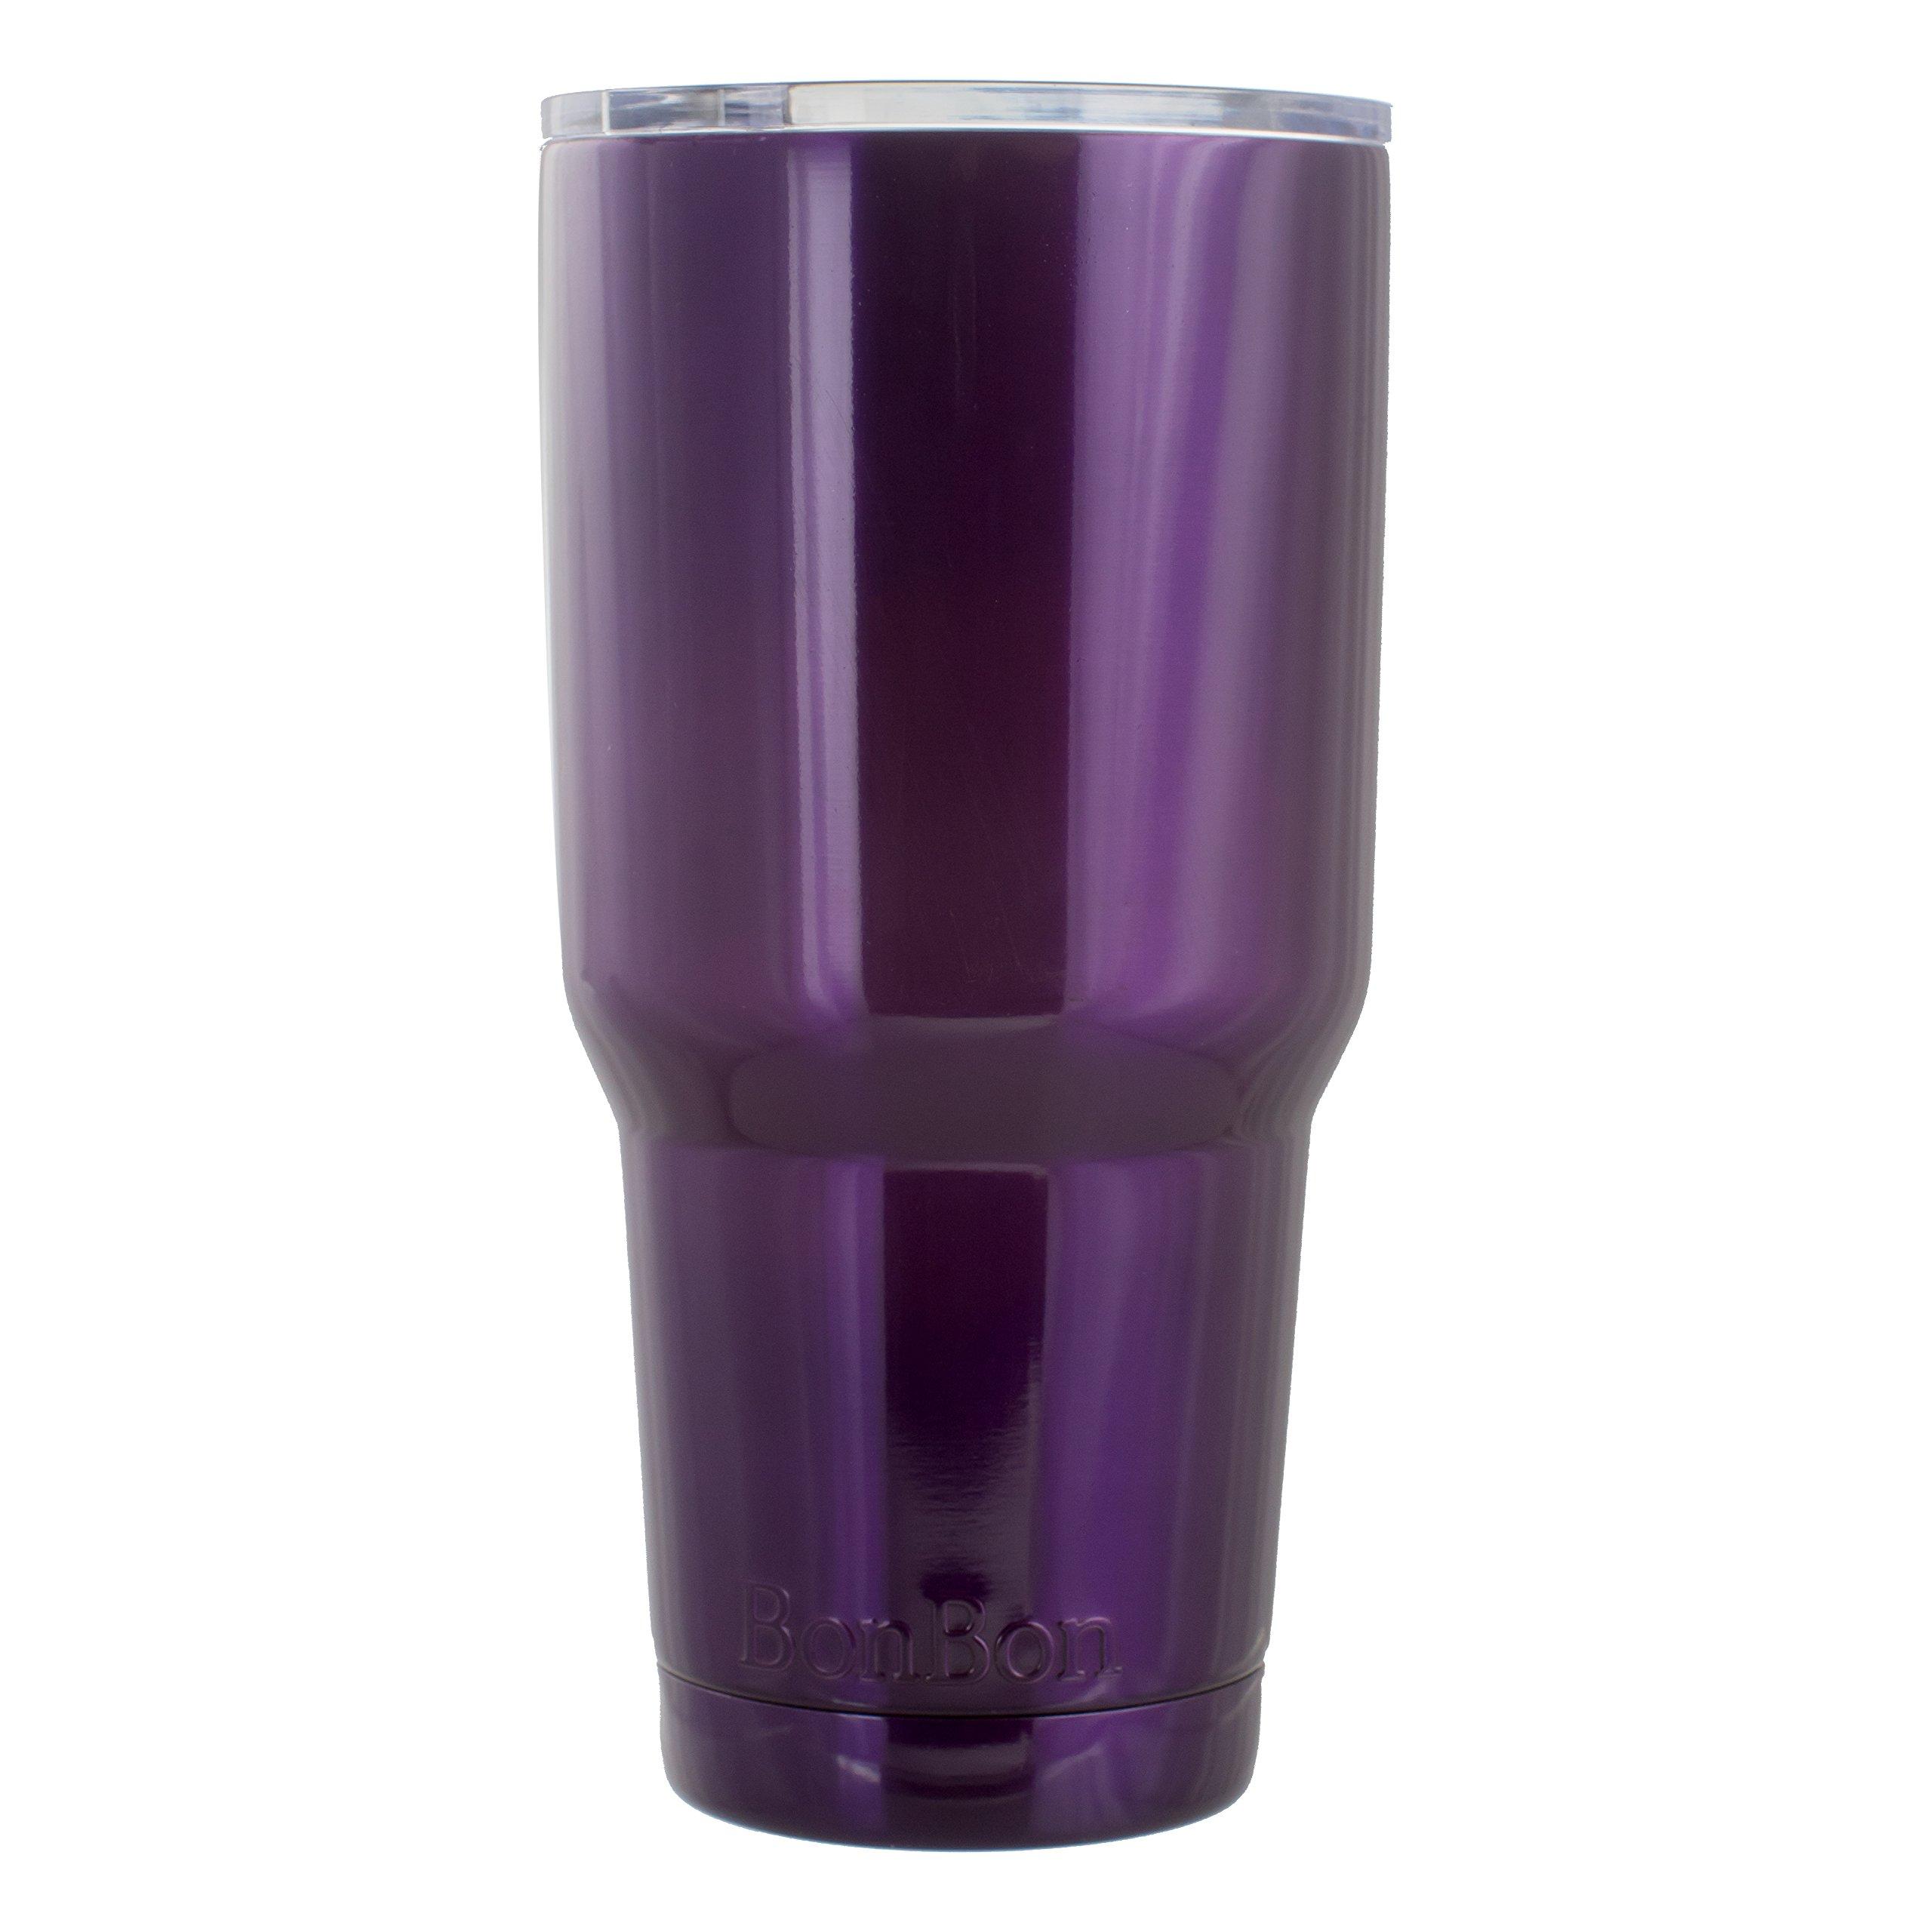 BonBon 30oz Travel Mug Vacuum Insulated Cup (Purple)